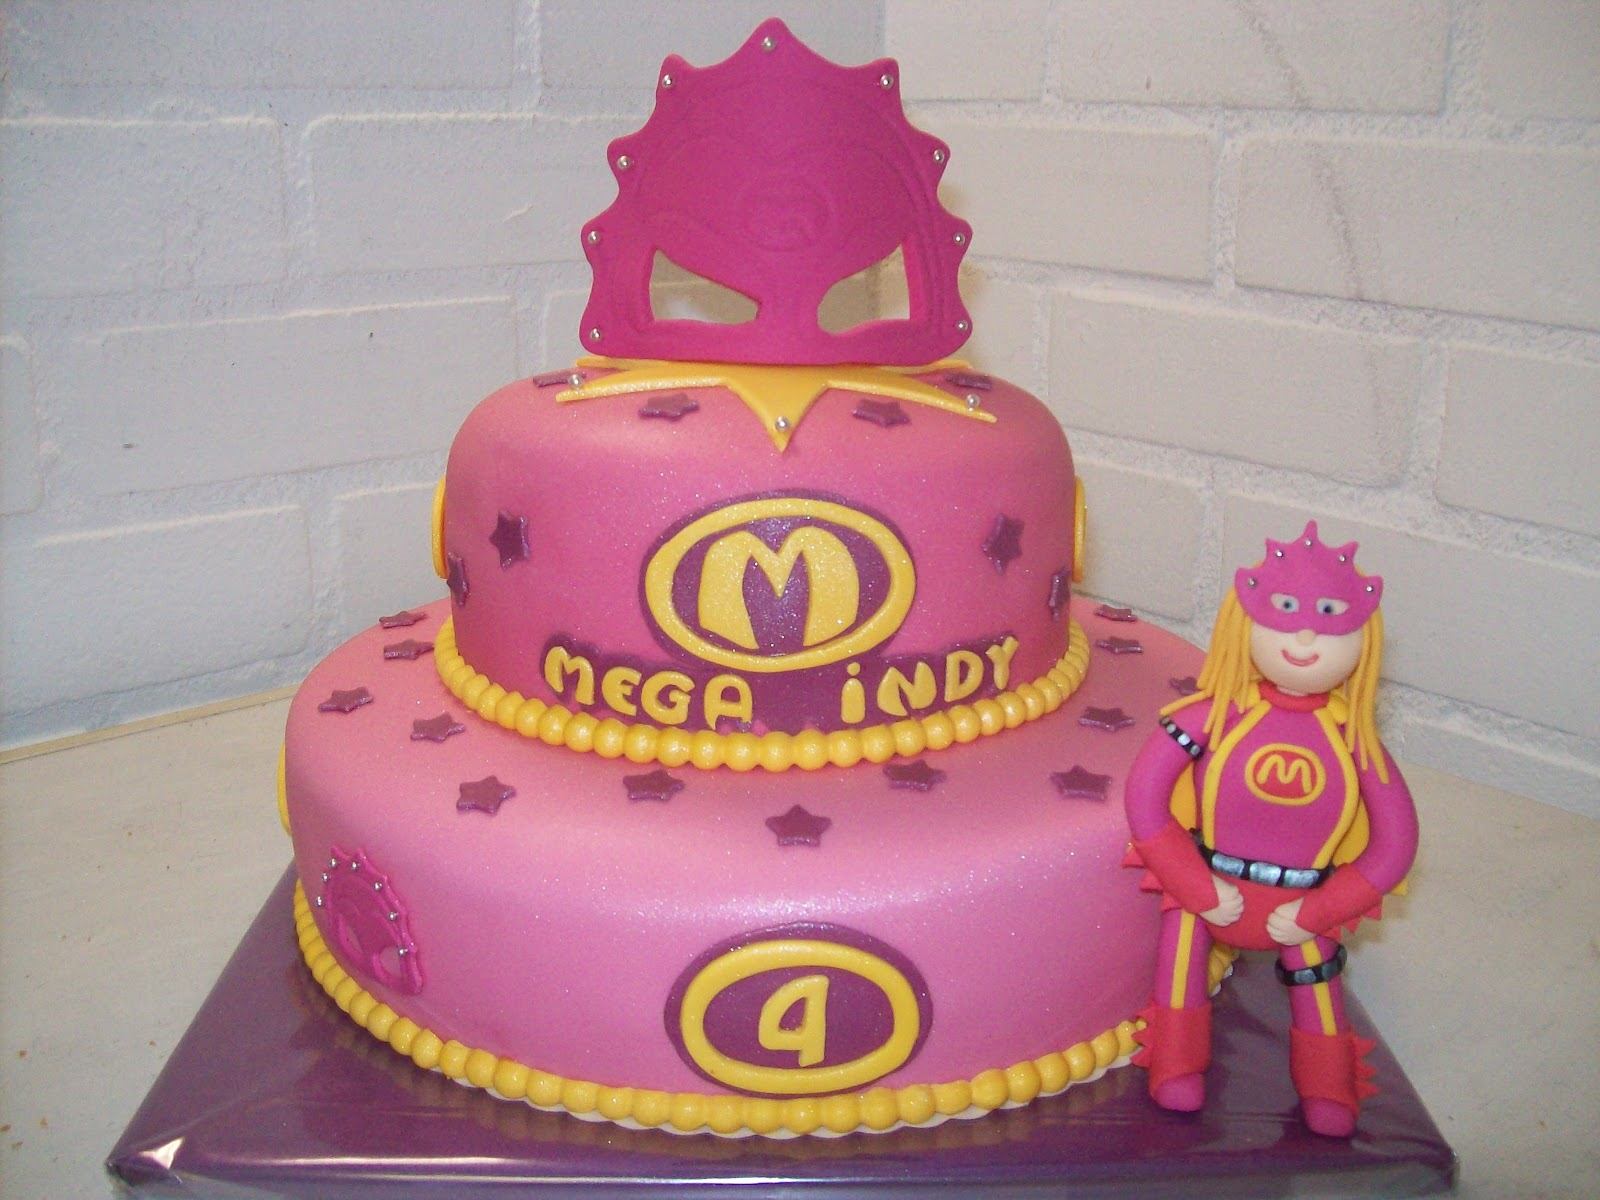 mega mindy taart maken Twee thema's 1 stapeltaart (mega Mindy/Nijntje) (Pagina 1  mega mindy taart maken